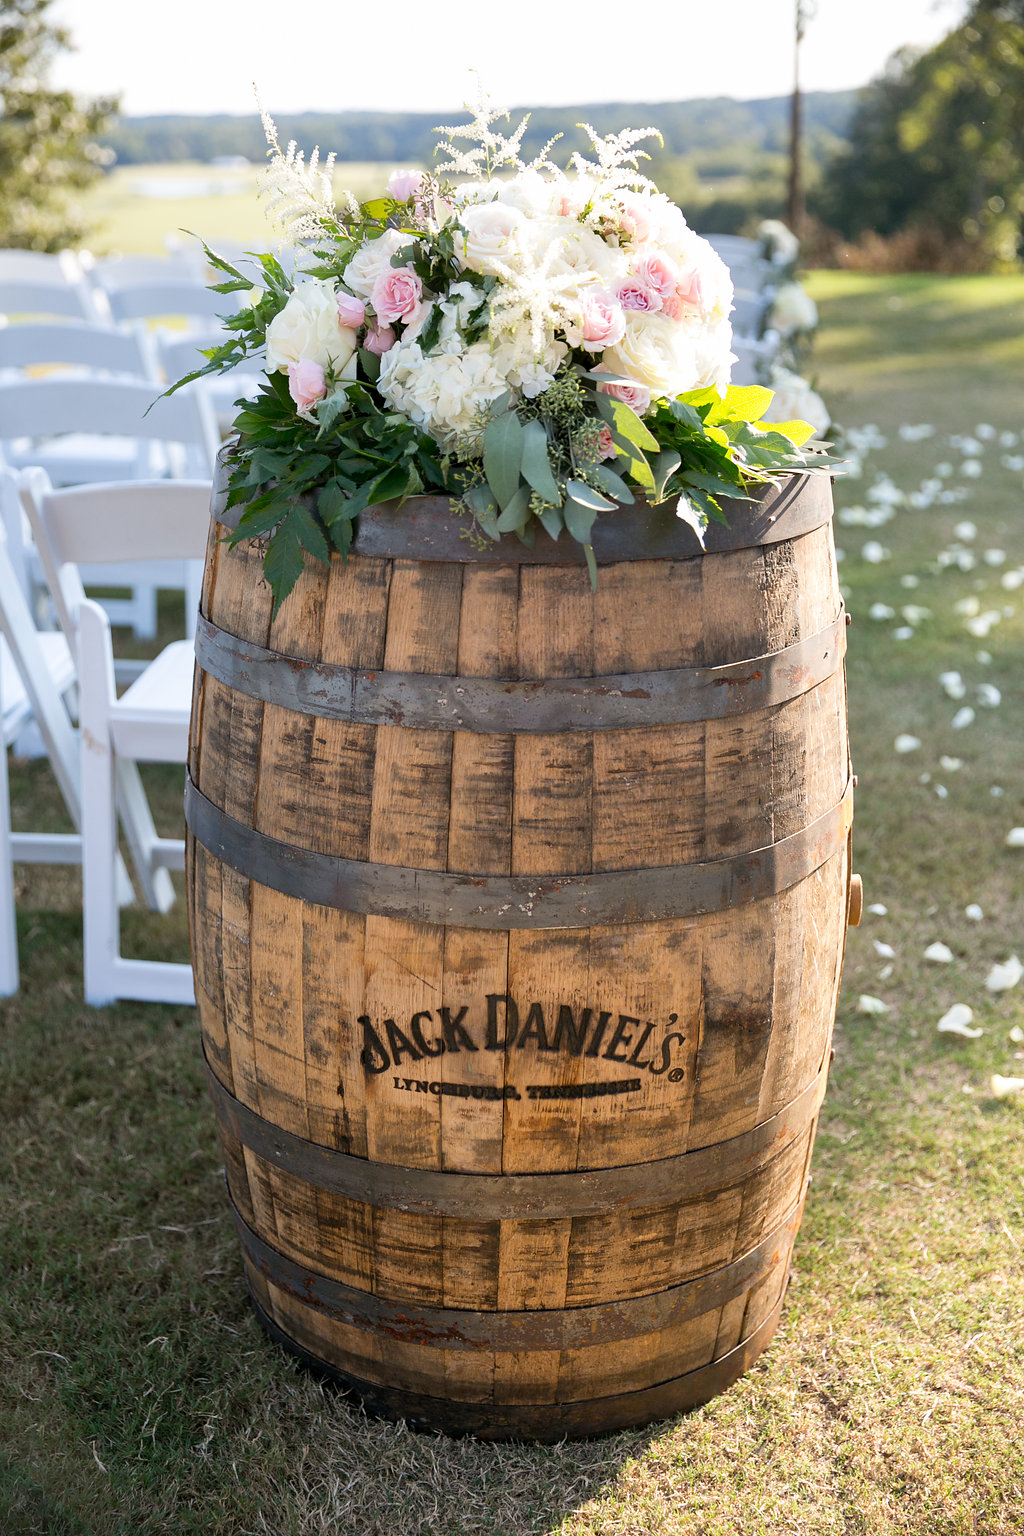 Foxhall-Resort-Wedding-Floral-Design-14.jpg